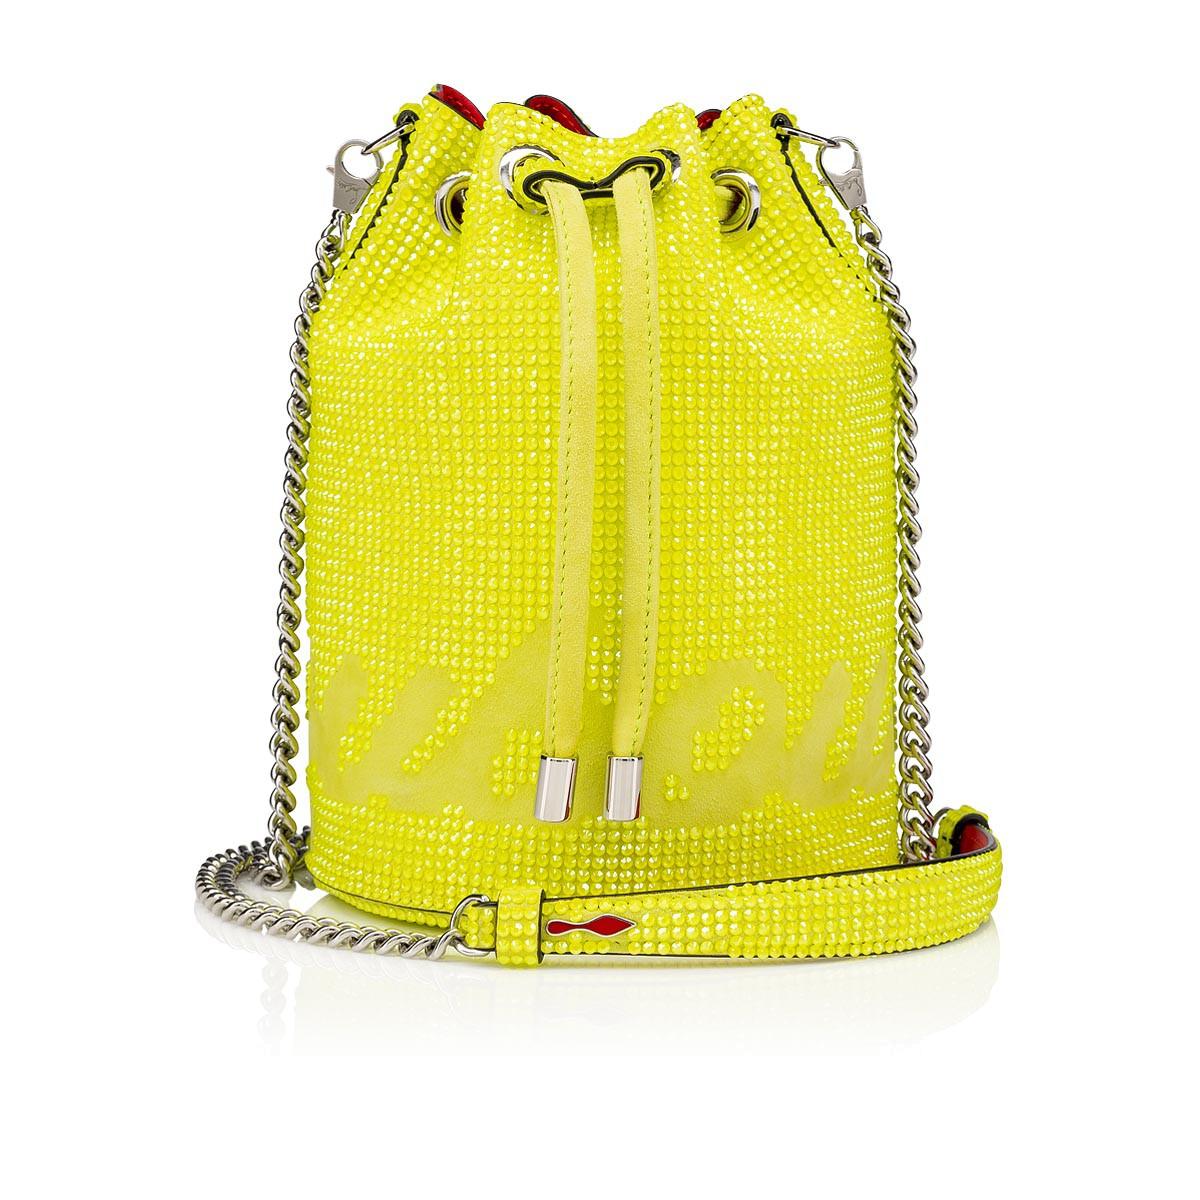 Bags - Marie Jane Bucket Bag - Christian Louboutin